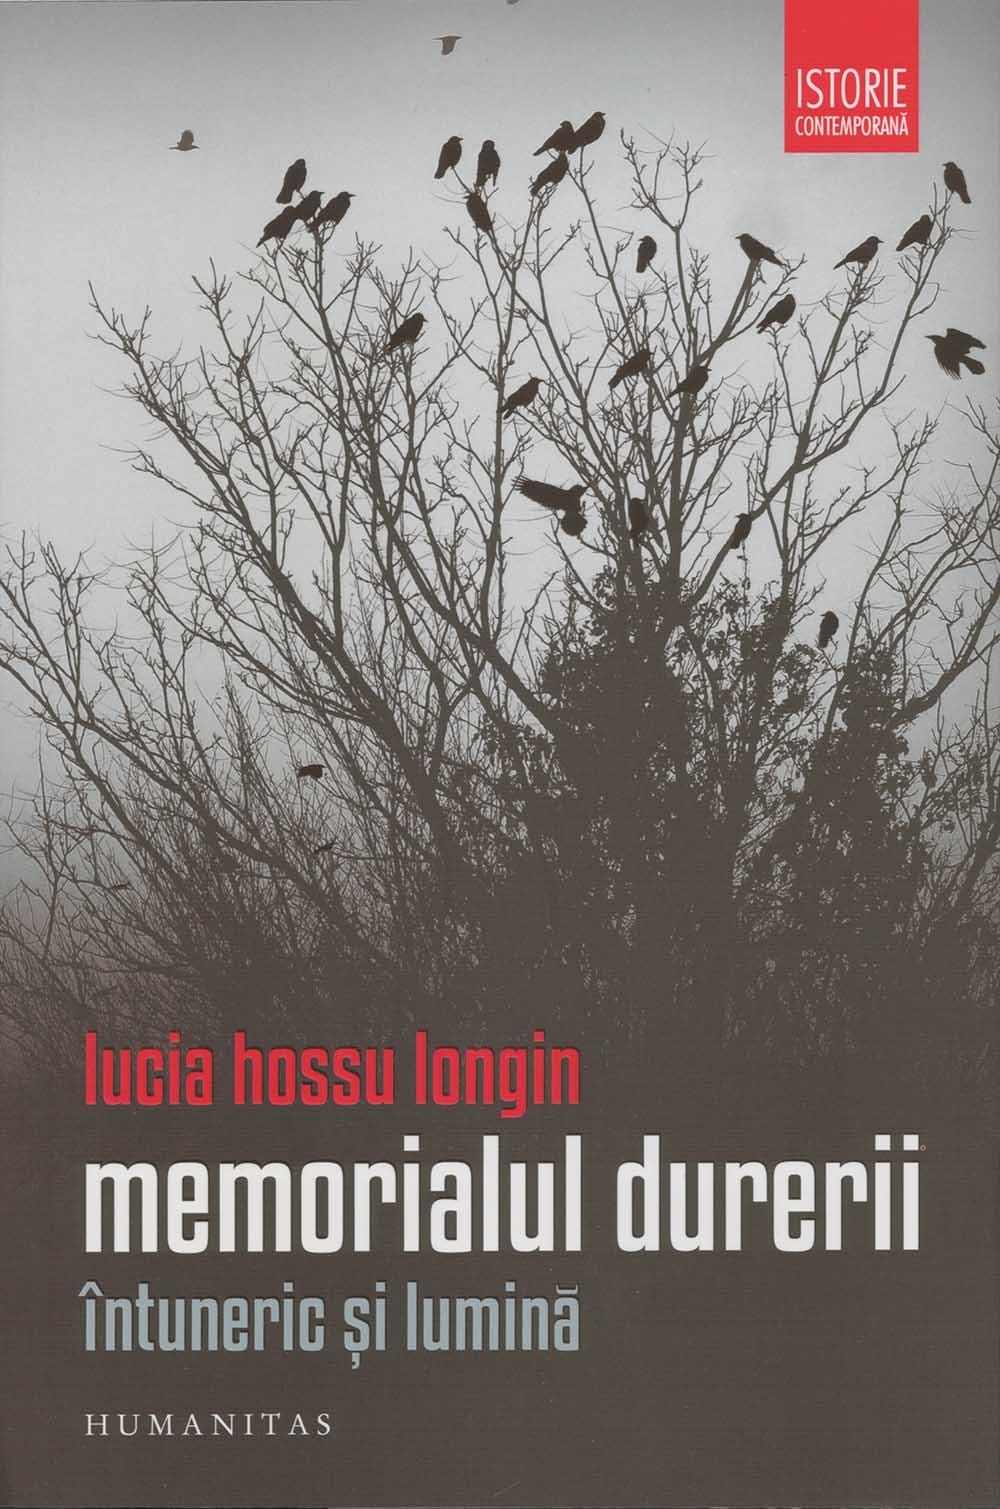 Memorialul durerii, intuneric si lumina